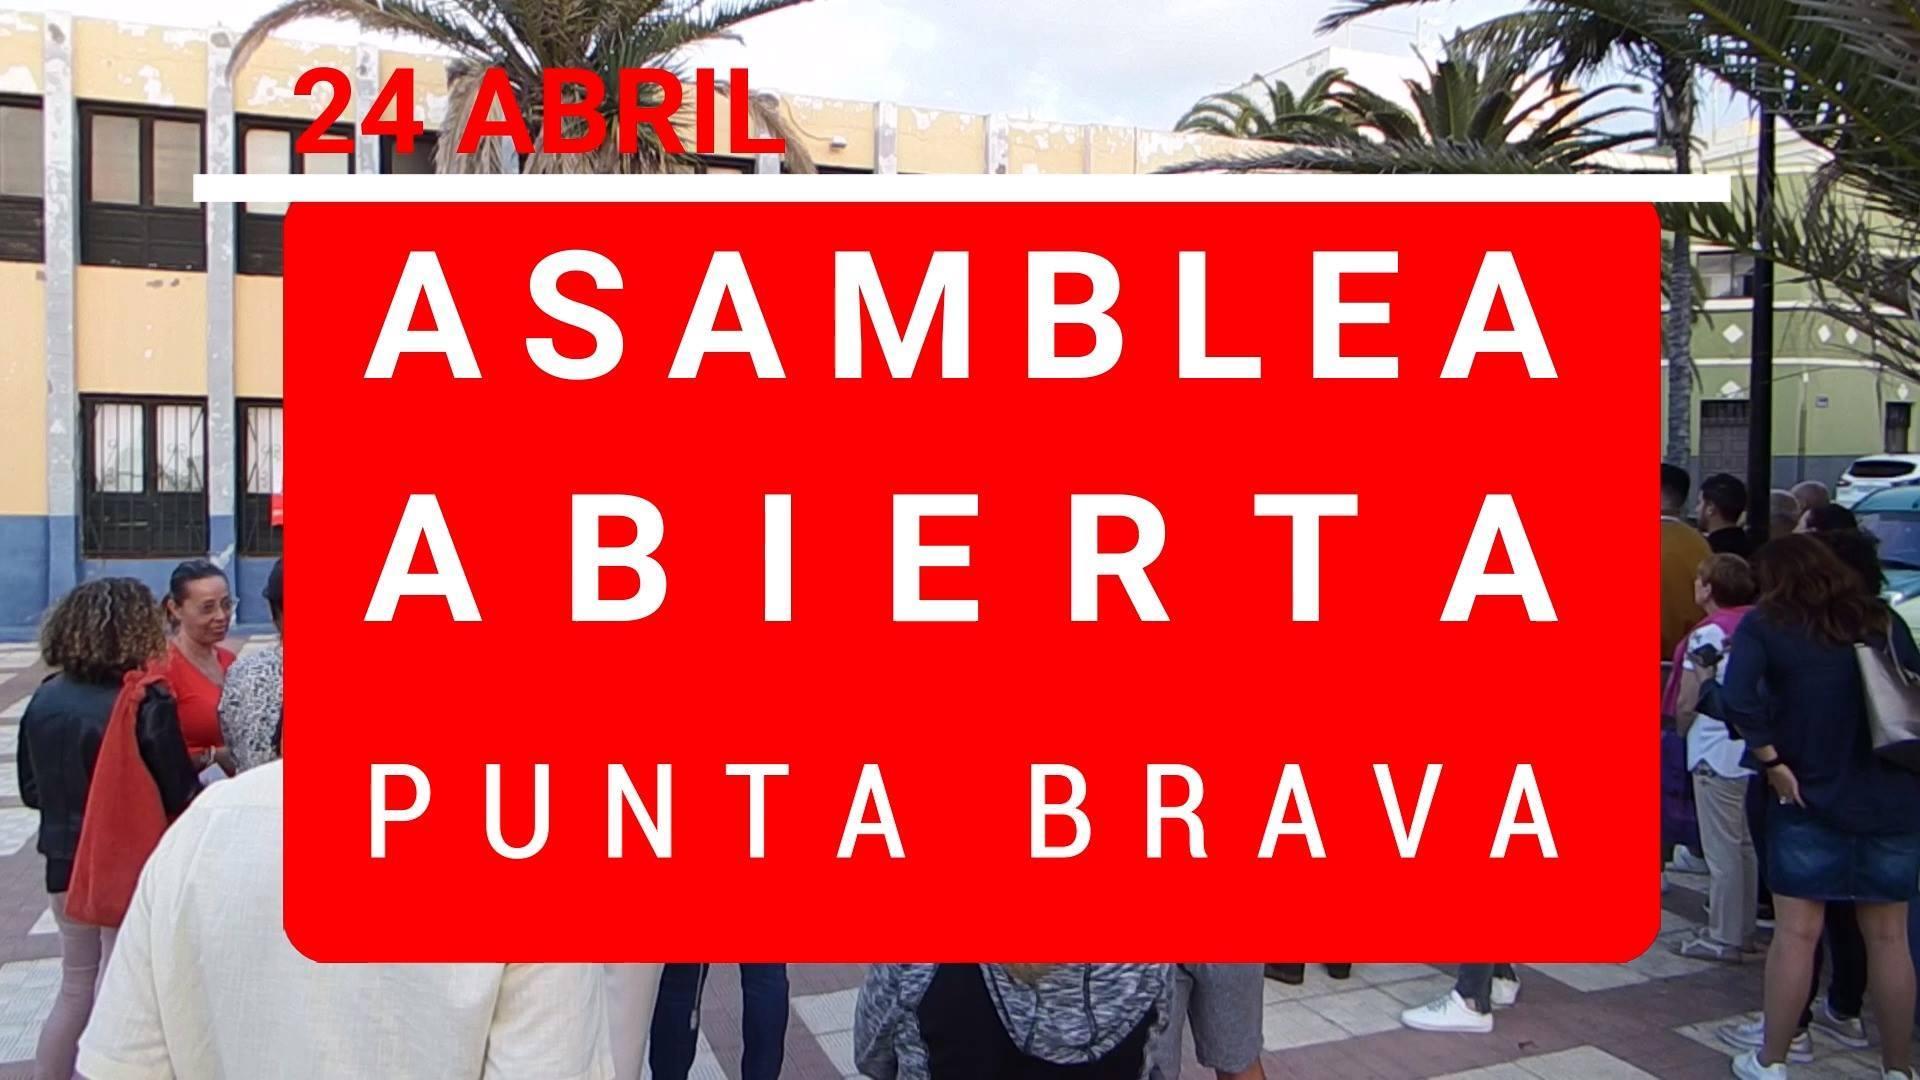 #diariodecampaña - ASAMBLEA ABIERTA EN PUNTA BRAVA